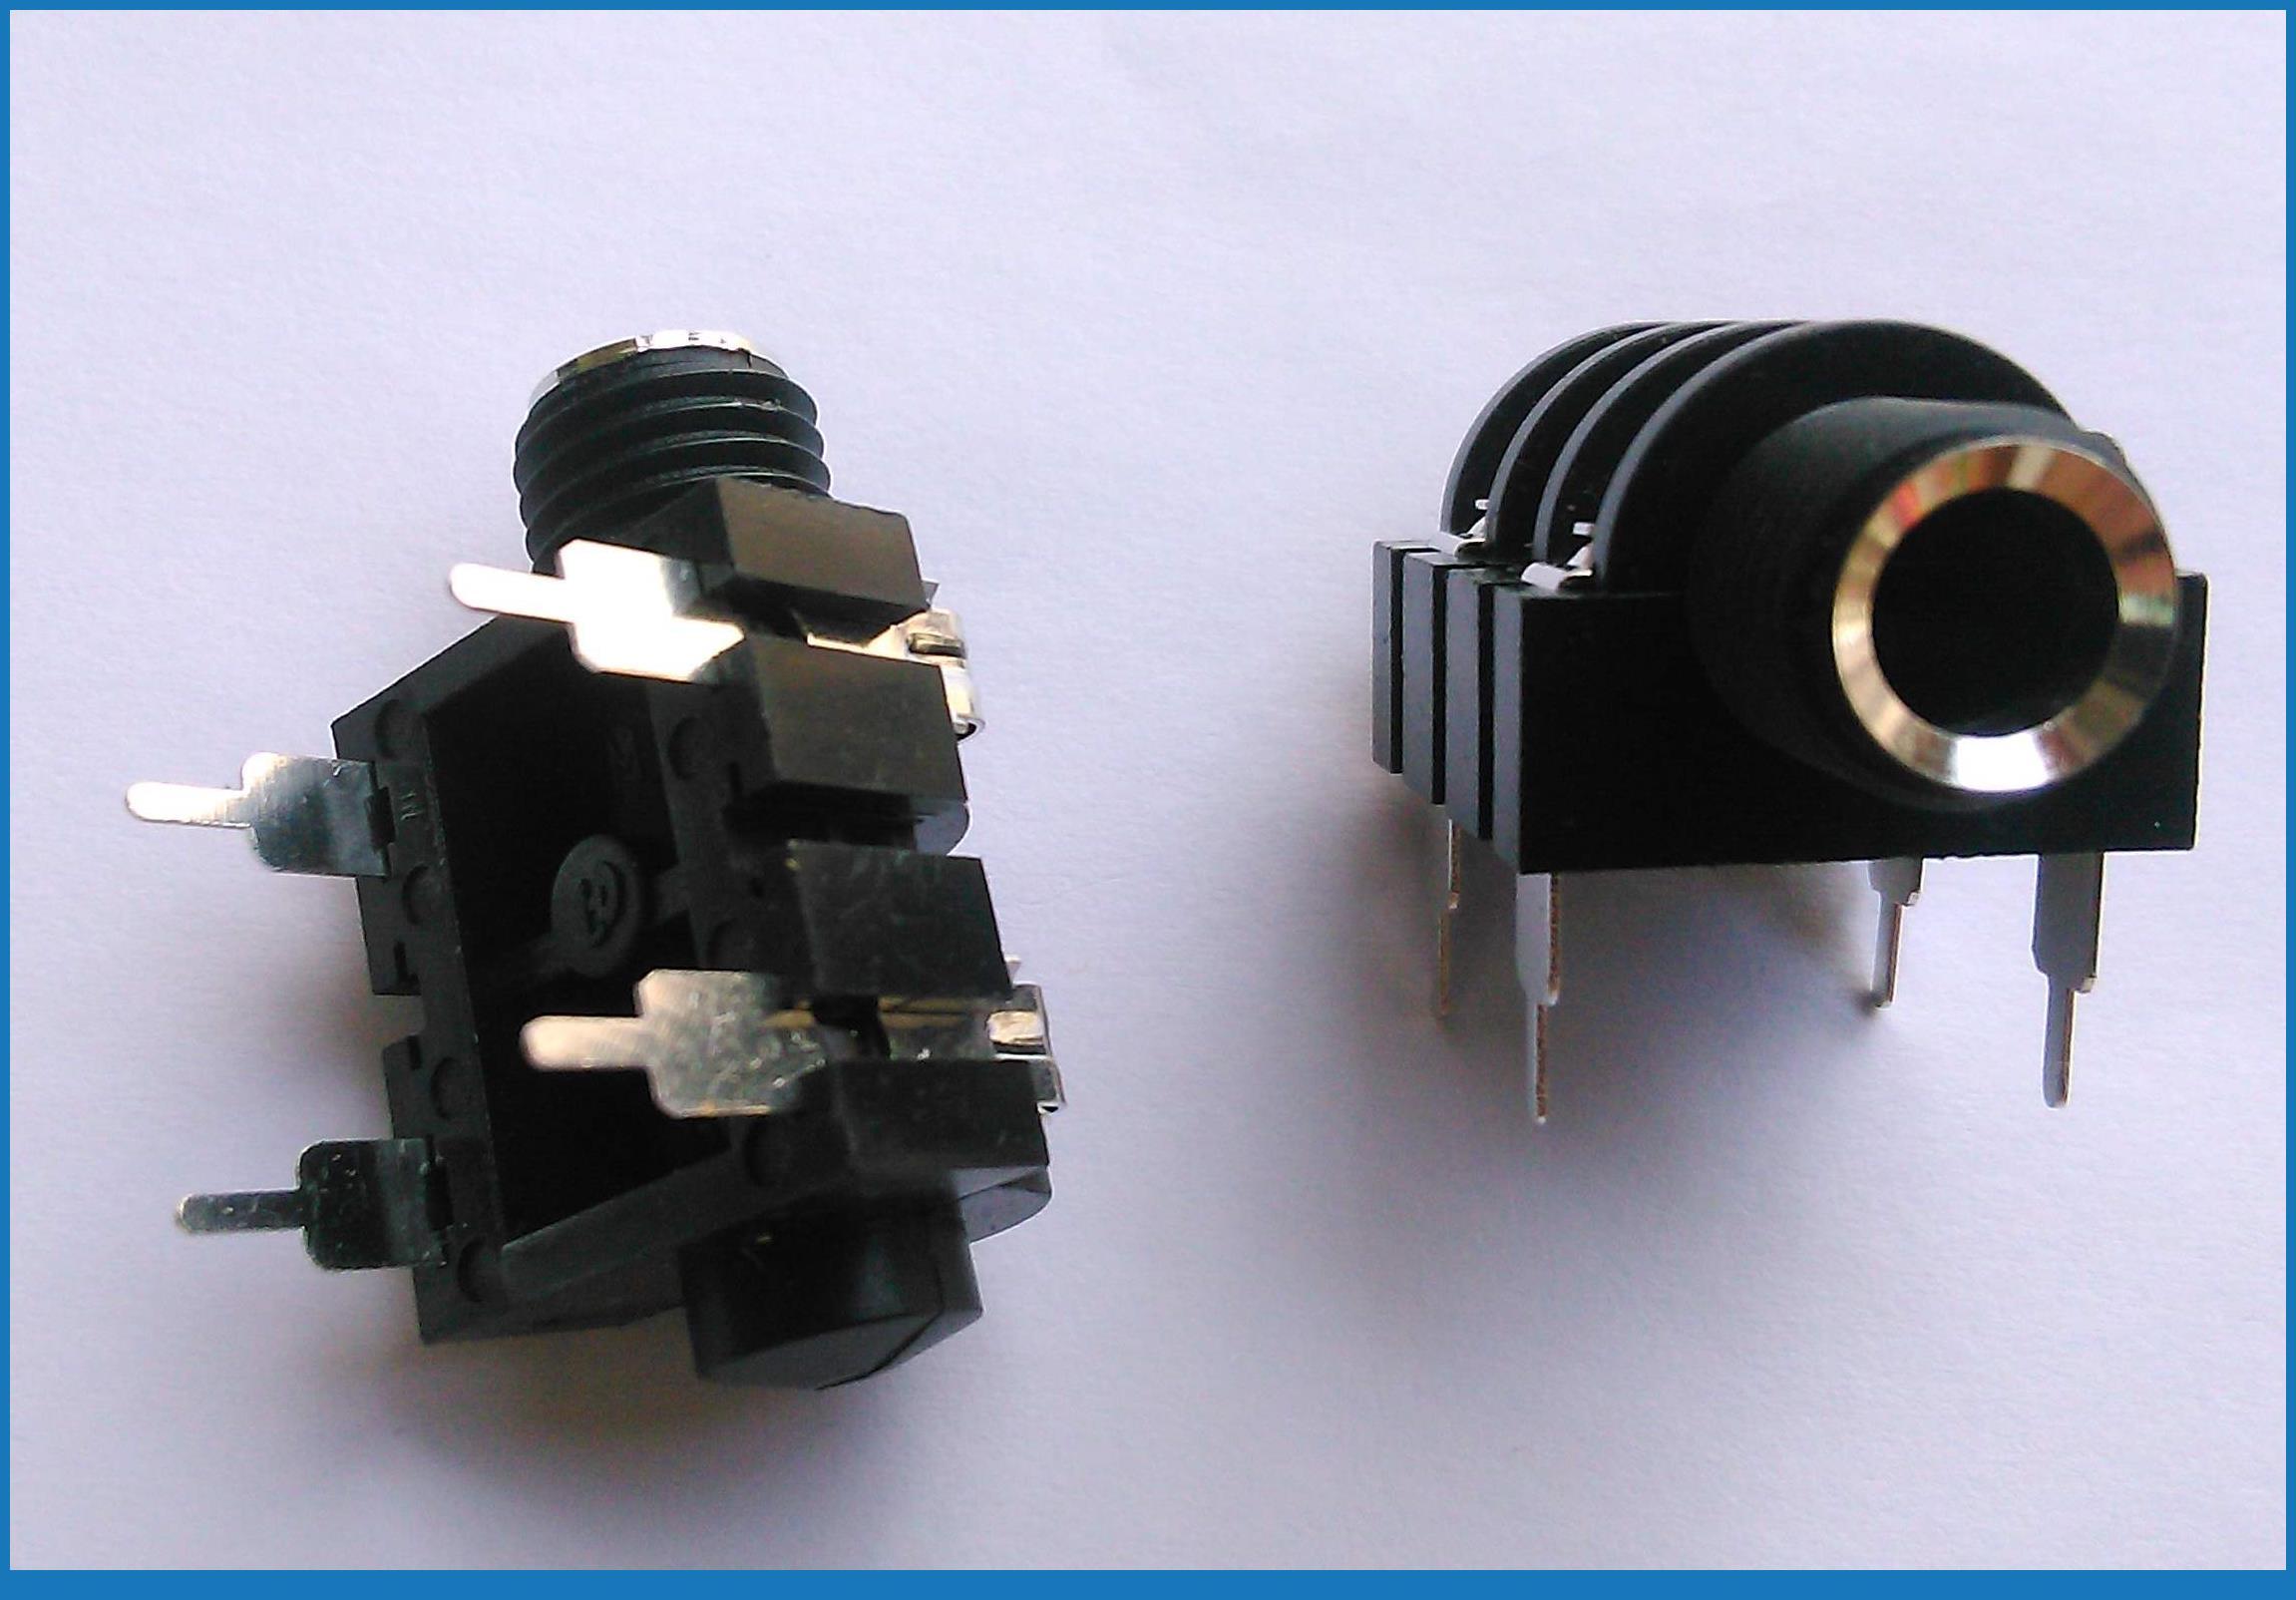 10pcs 6 35mm mono headphone jack microphone 1 4 panel wiring socket amplifiers 1 4 6 35mm mono jack socket panel in connectors from lights lighting on  [ 2302 x 1604 Pixel ]